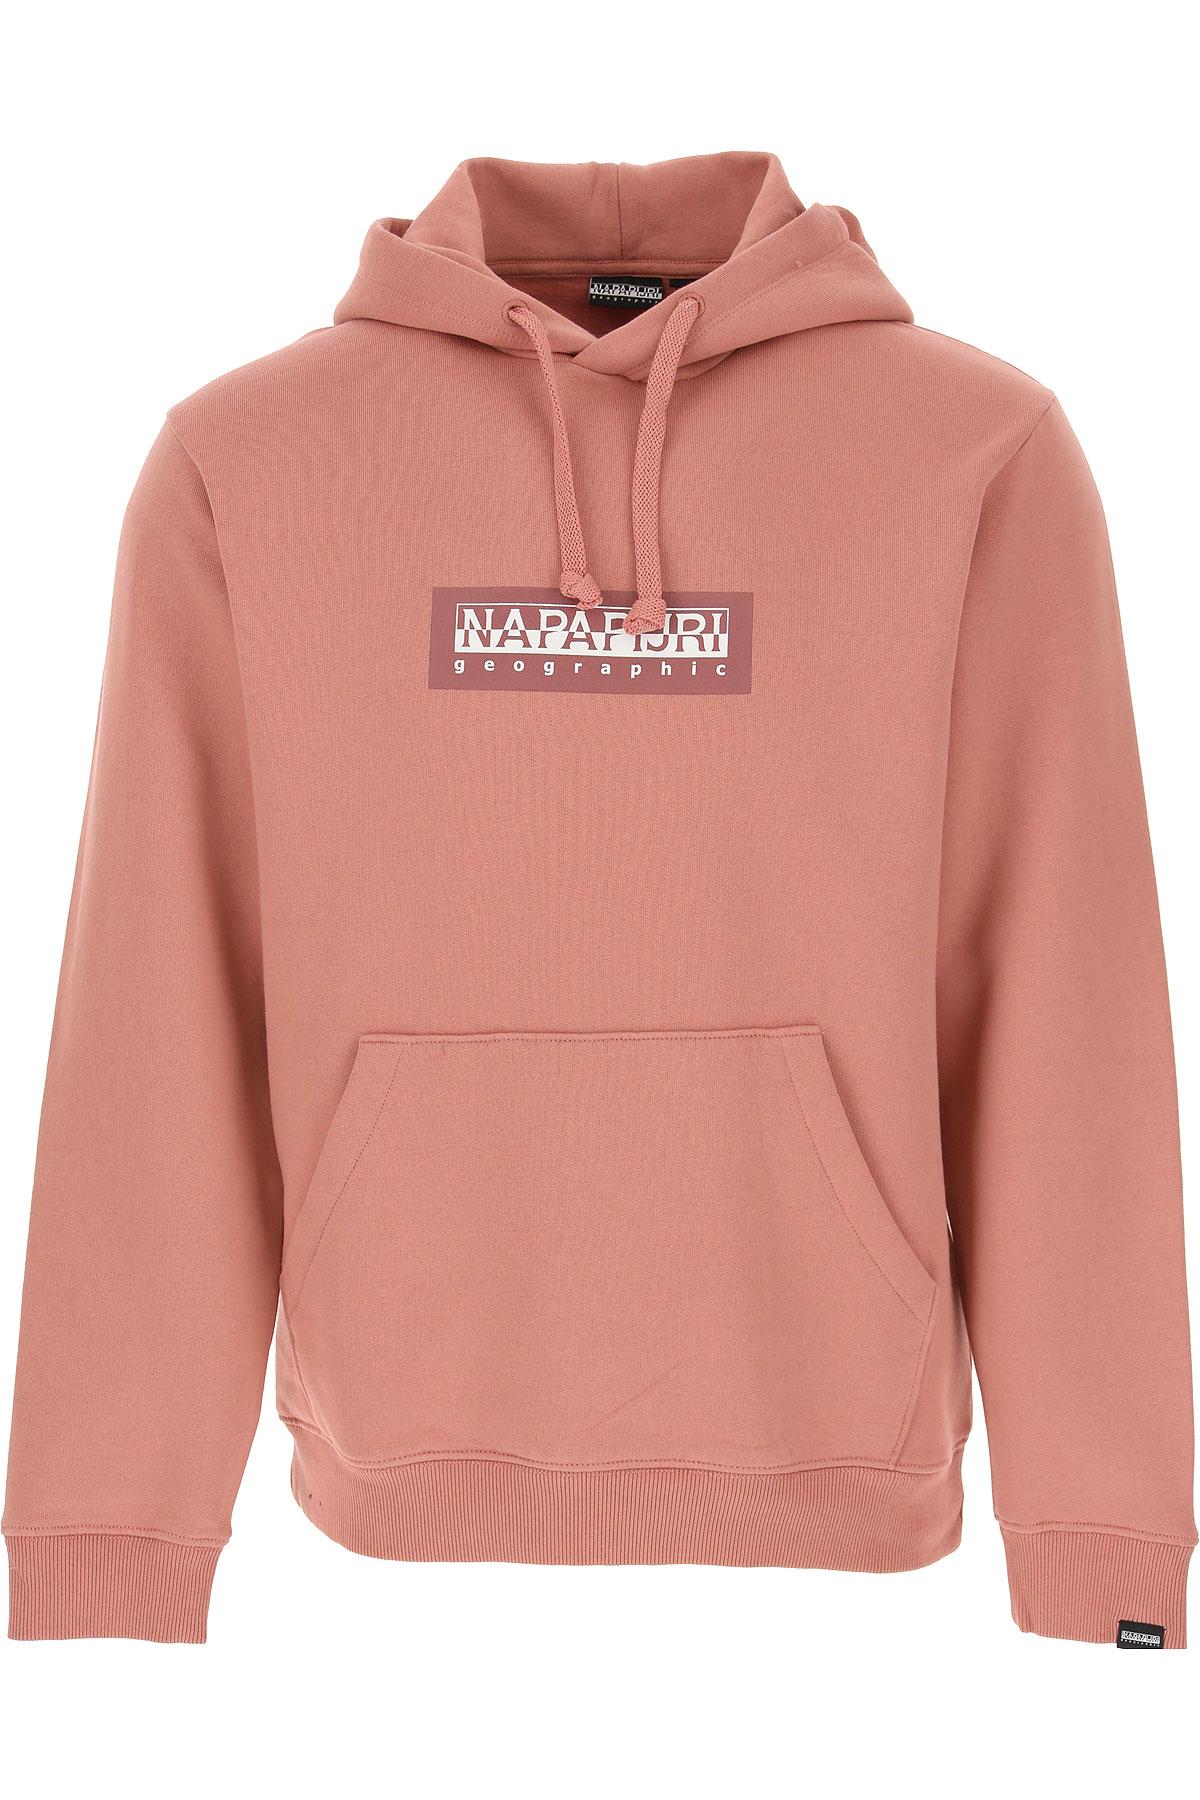 Napapijri Sweatshirt for Men On Sale, Old Pink, Cotton, 2019, M S XS